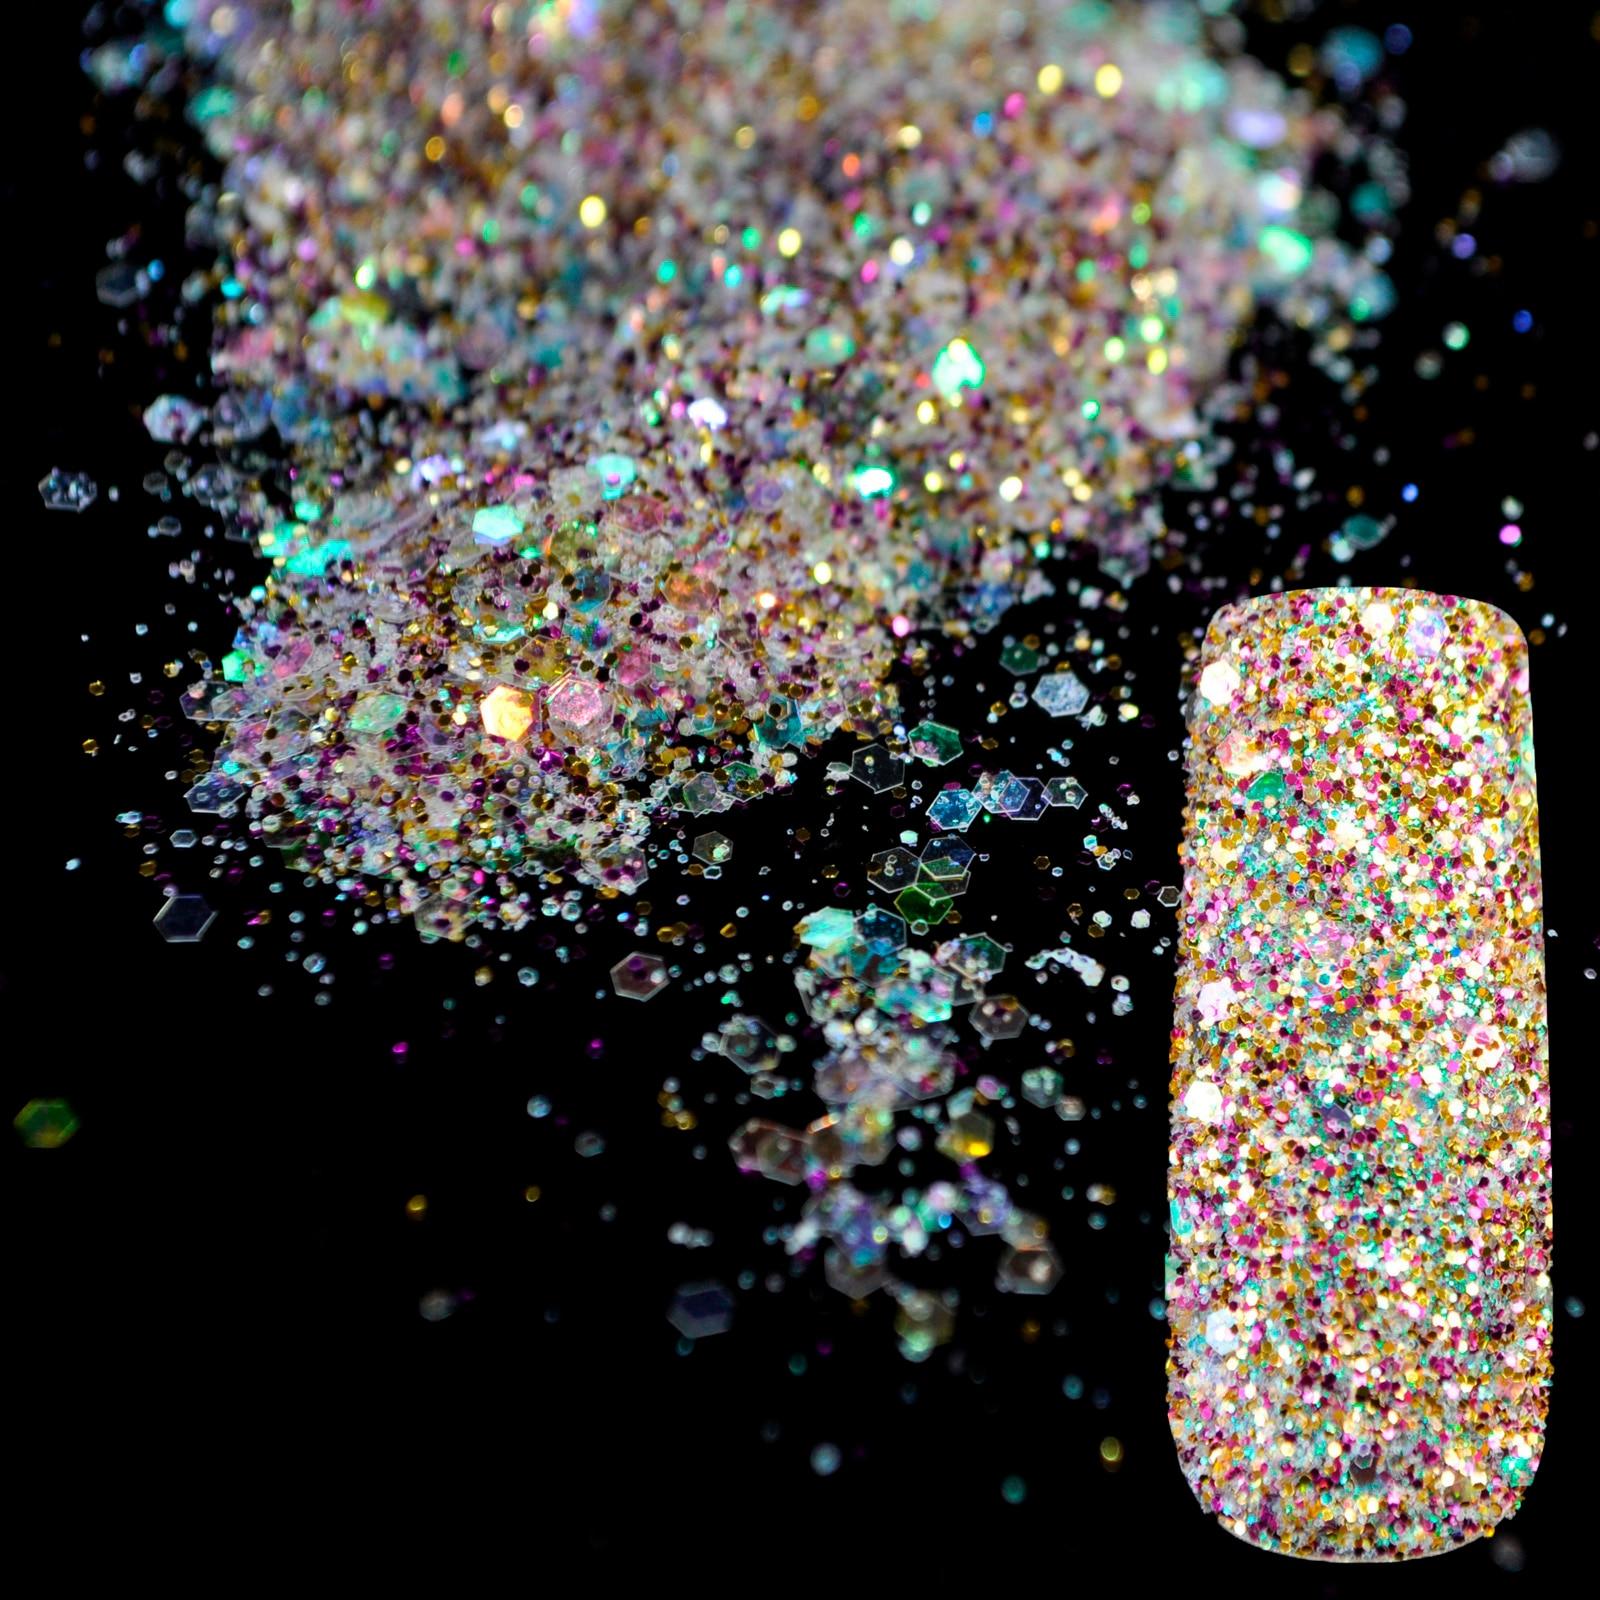 Buy Shining Abalone Transparents Sequins Dust Diy The Wet Brush Gemstone Nail Art Glitter Gem Designs Purple Gold Acrylic Uv Mix Powder 283 From